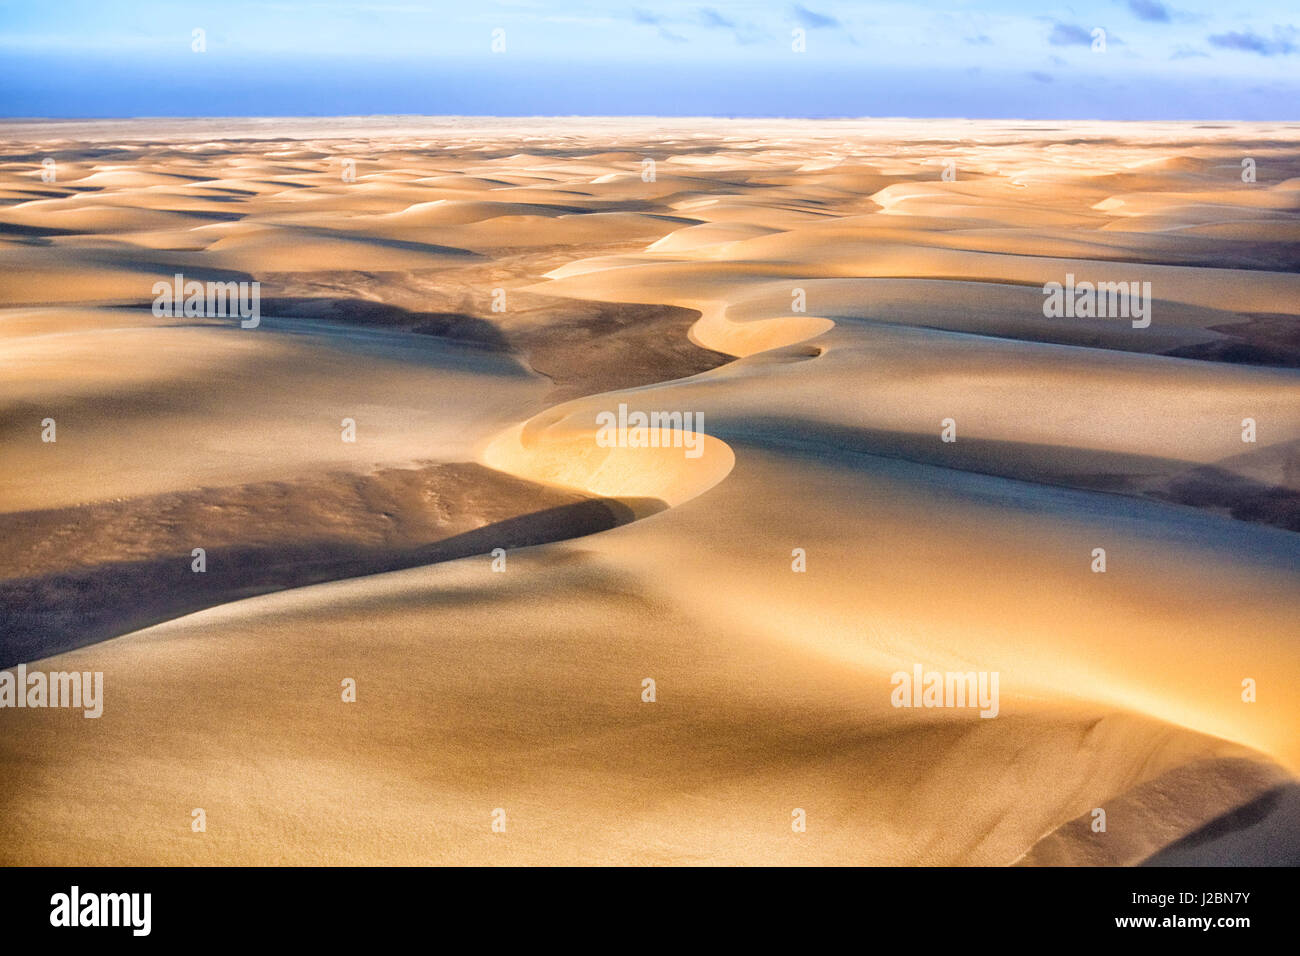 Skeleton Coast, Namibia. Aerial view of immense sand dunes. - Stock Image